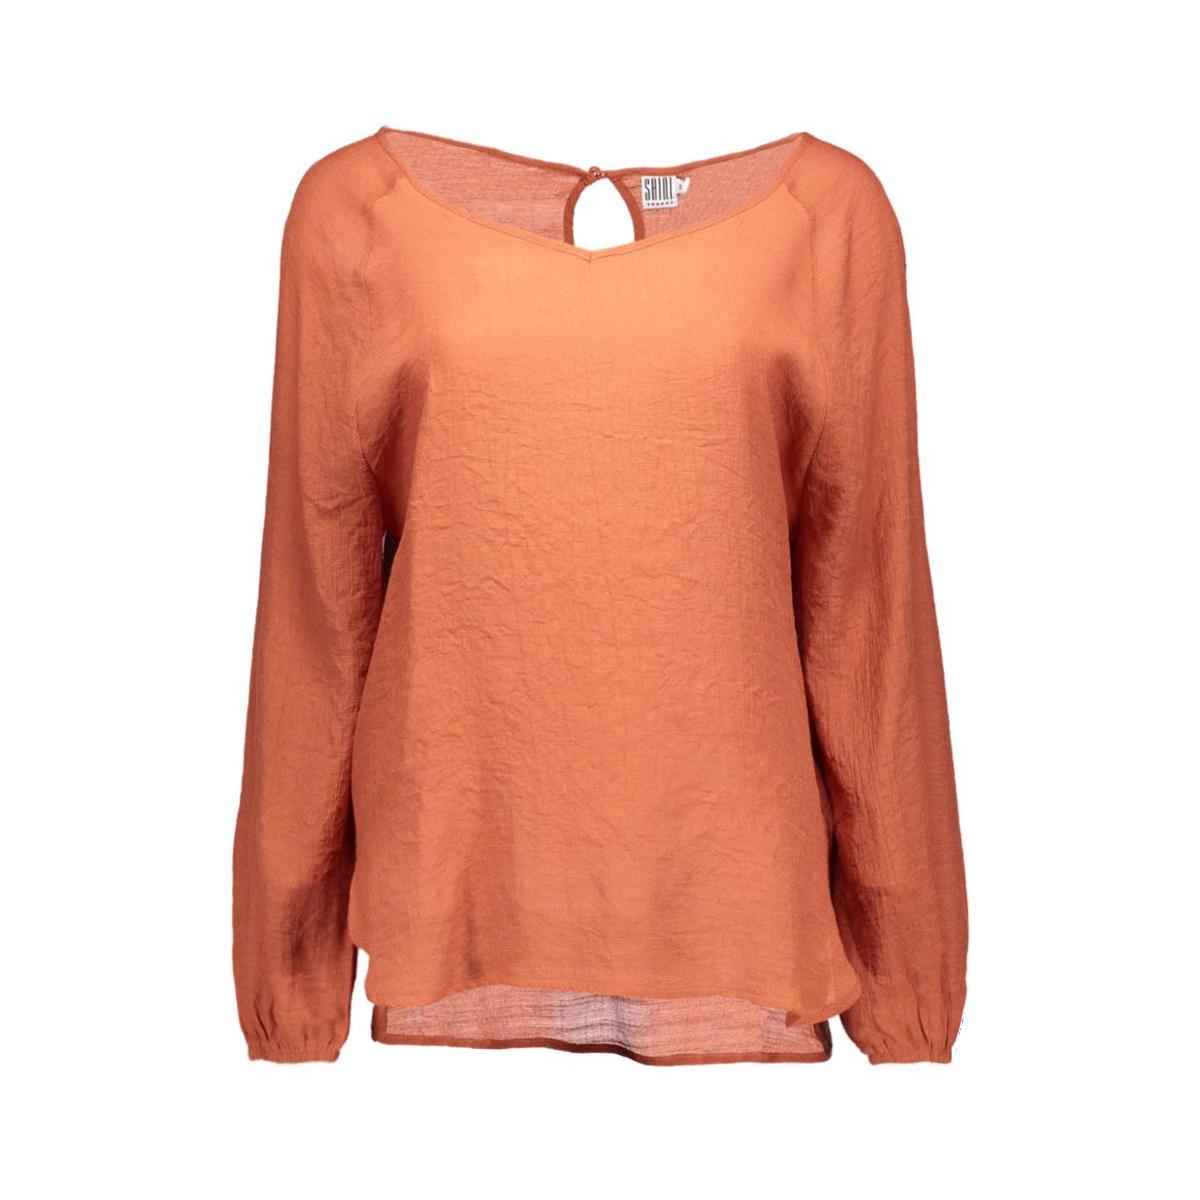 n1146 saint tropez blouse 7276